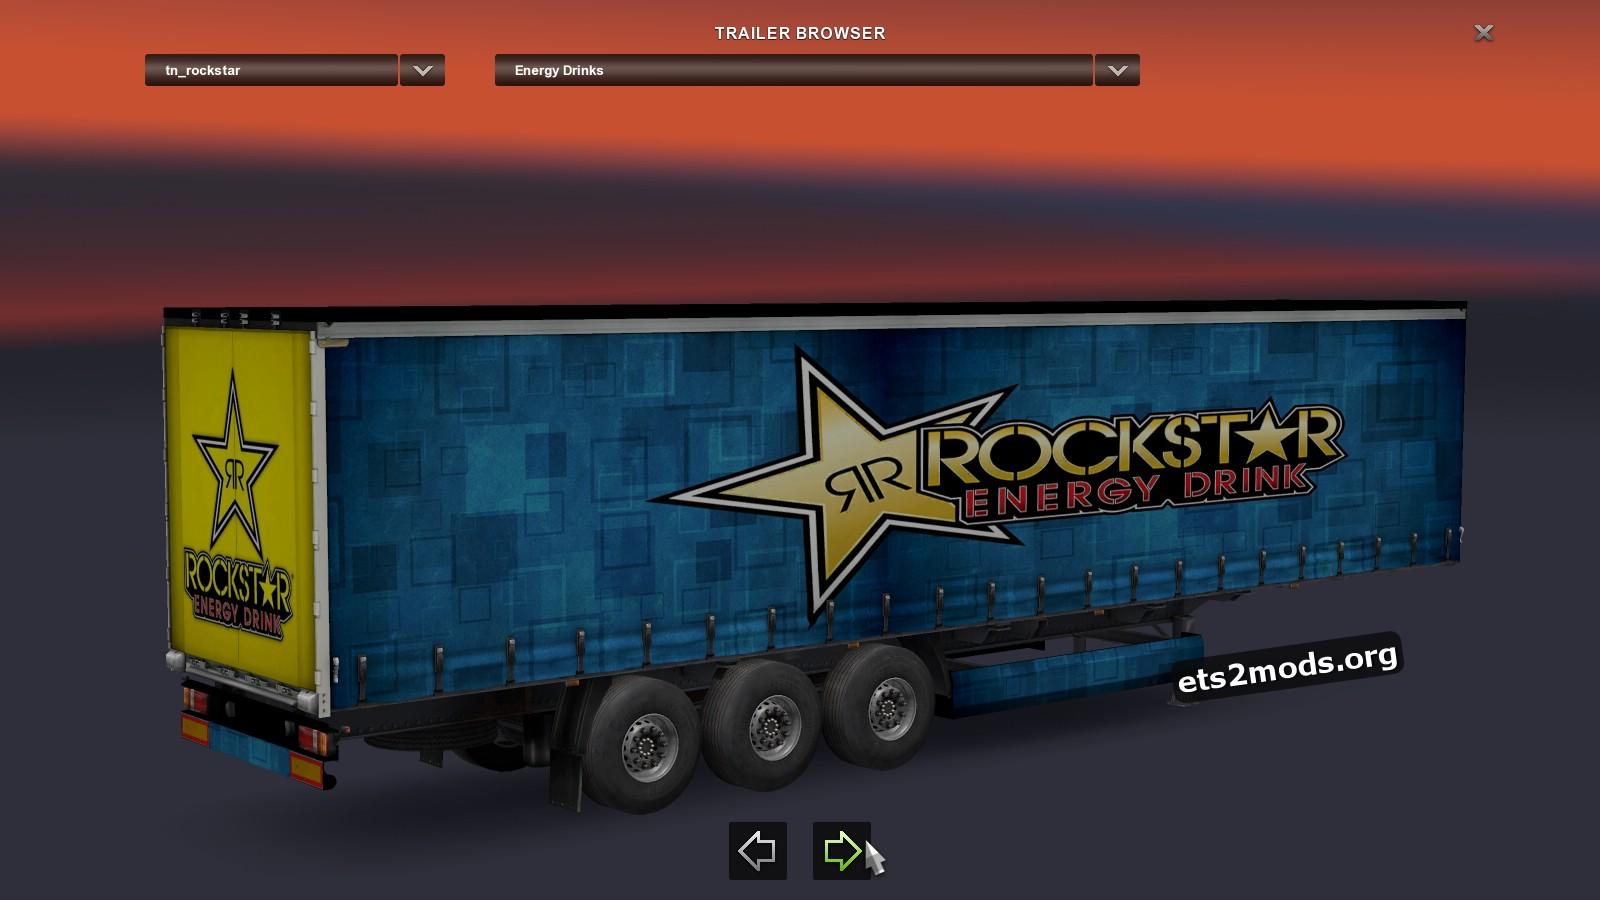 Trailer - Rockstar Energy